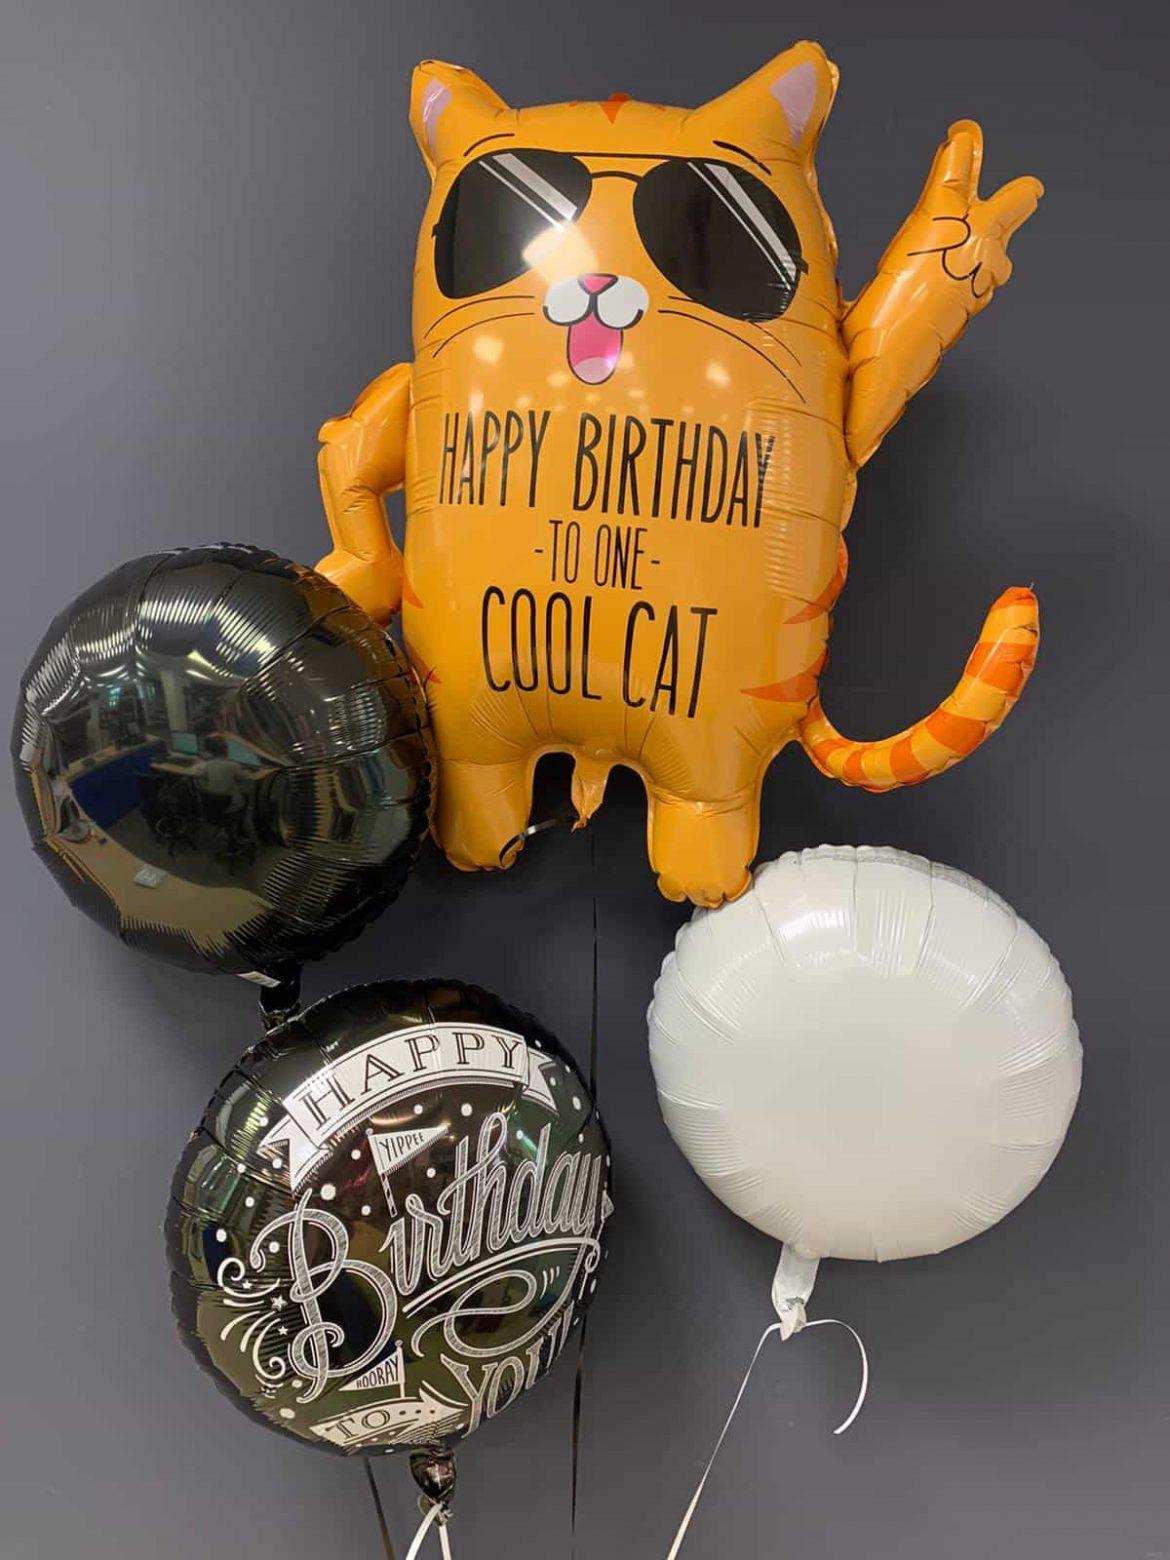 Cool Cat Ballon €7,90<br />Happy Birthday €5,50<br />Dekoballons €4,50 1